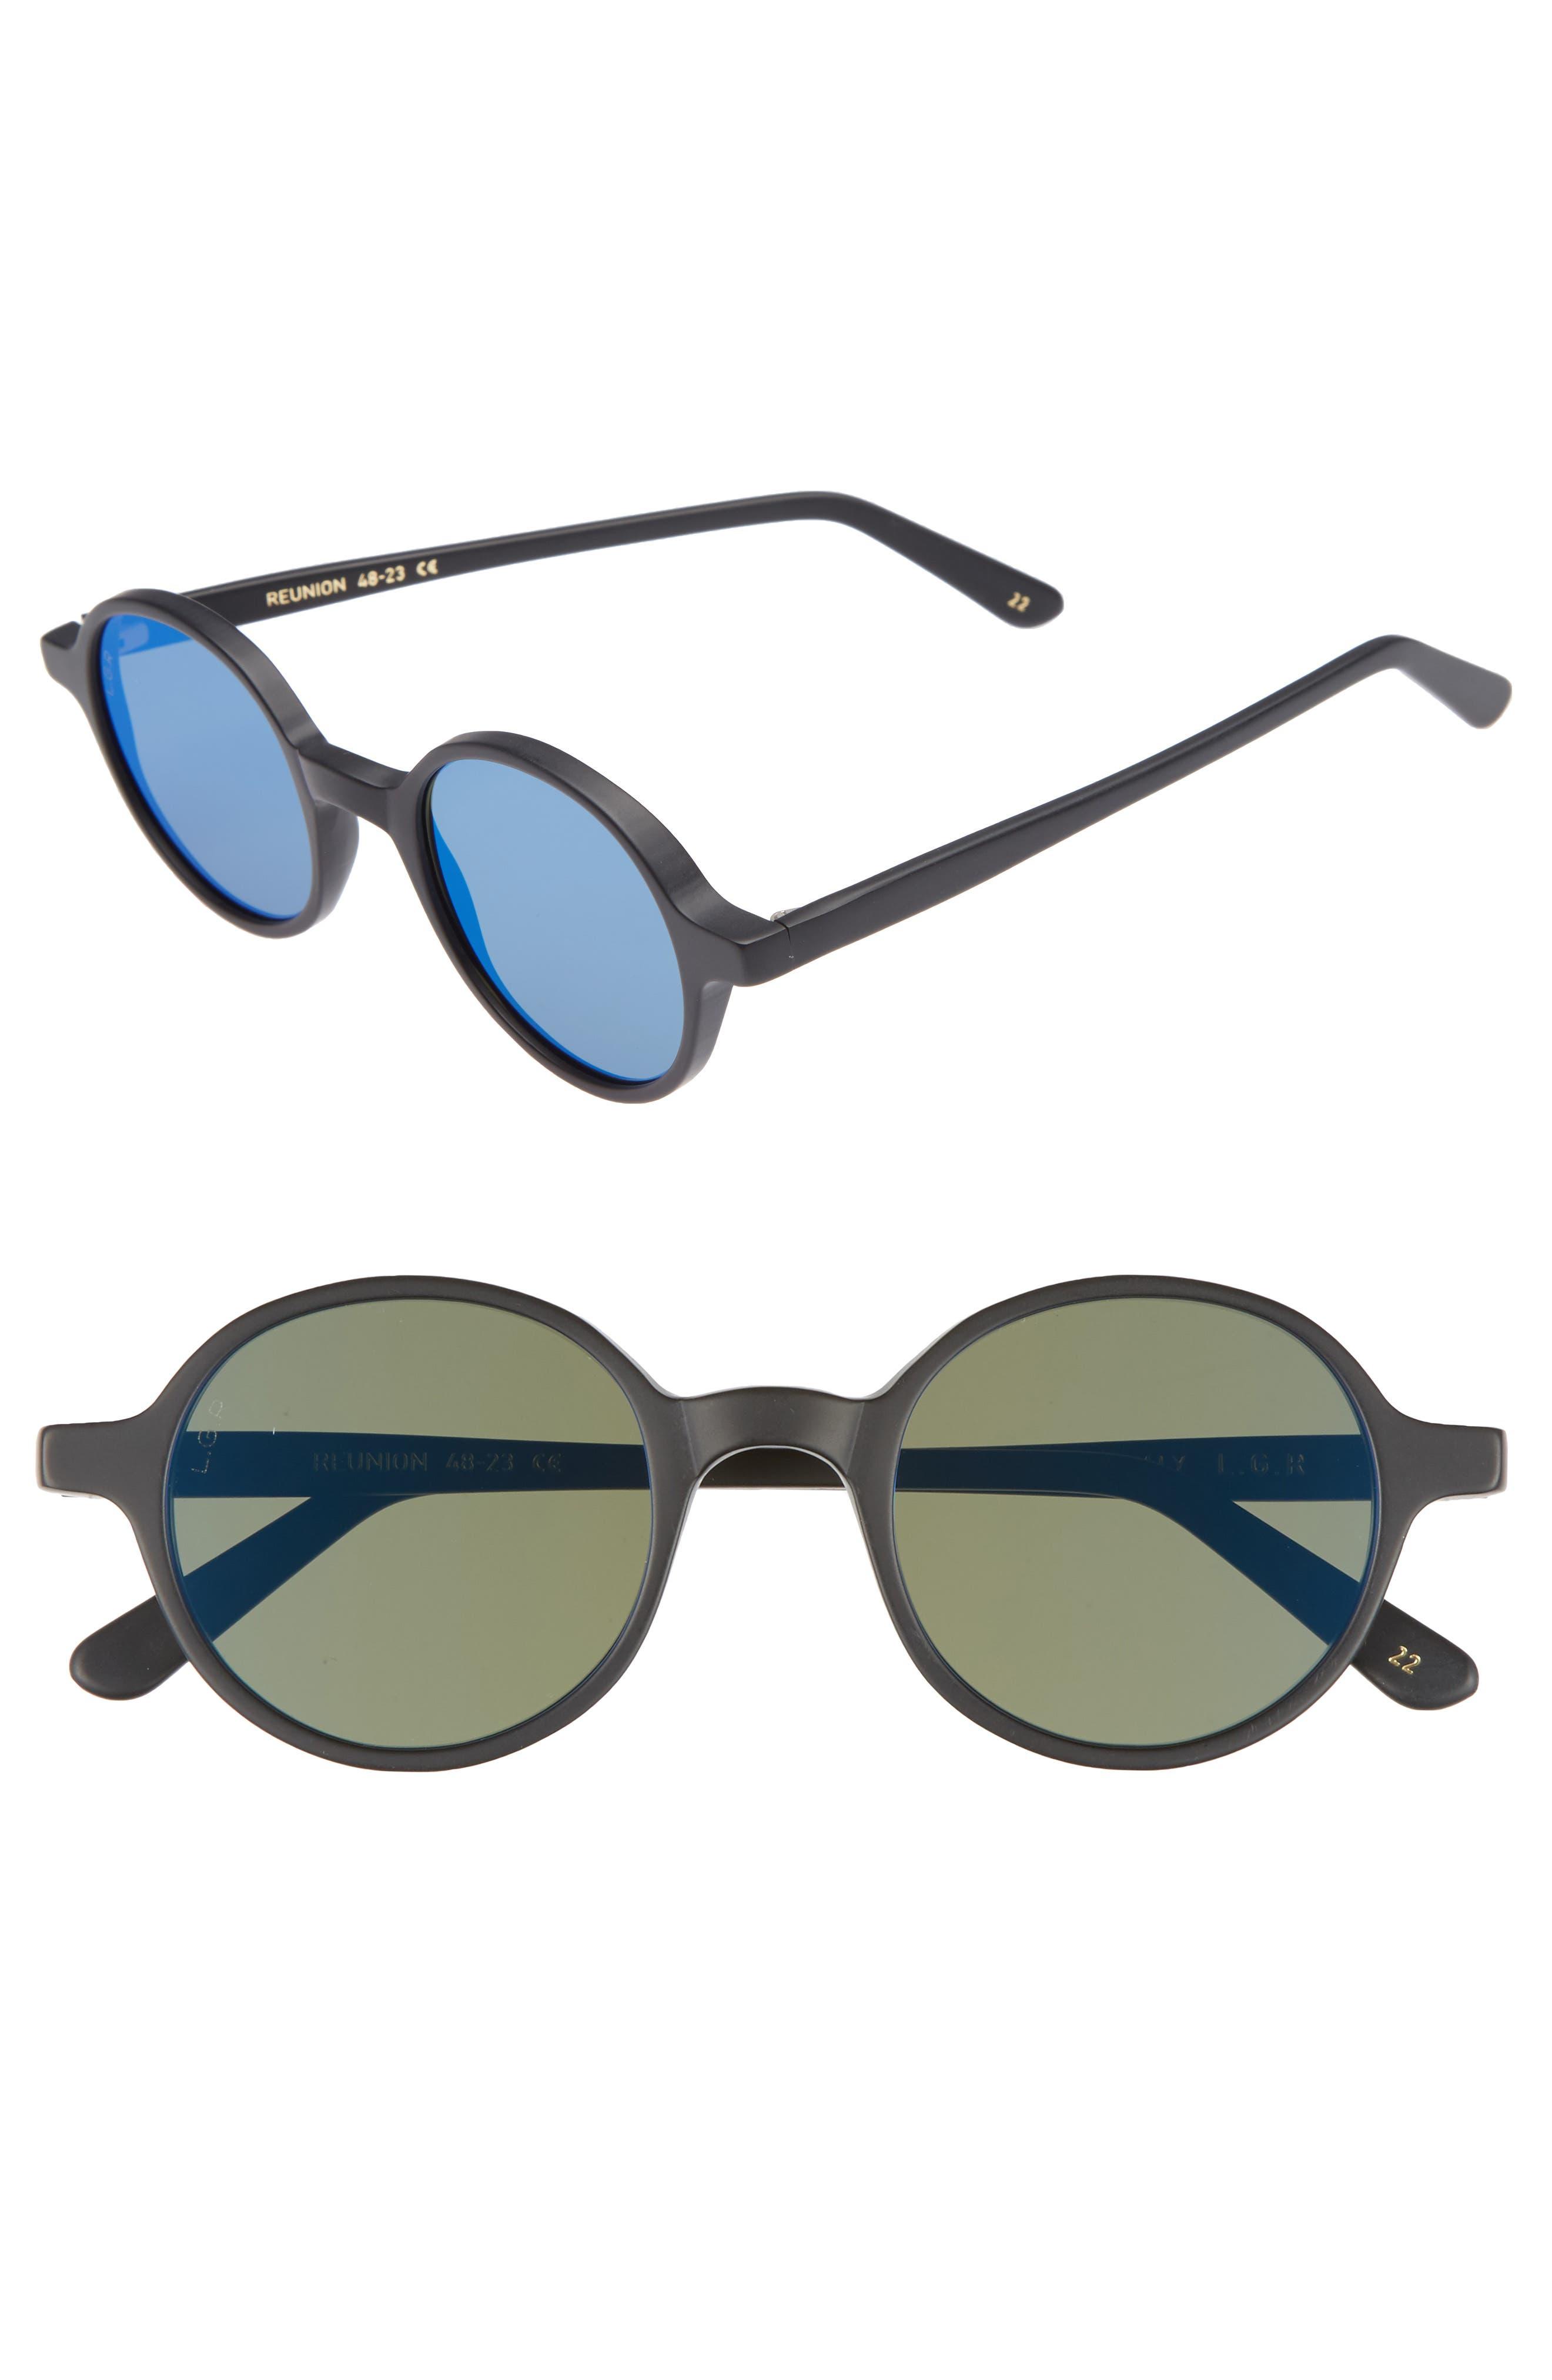 Reunion 48mm Sunglasses,                             Main thumbnail 1, color,